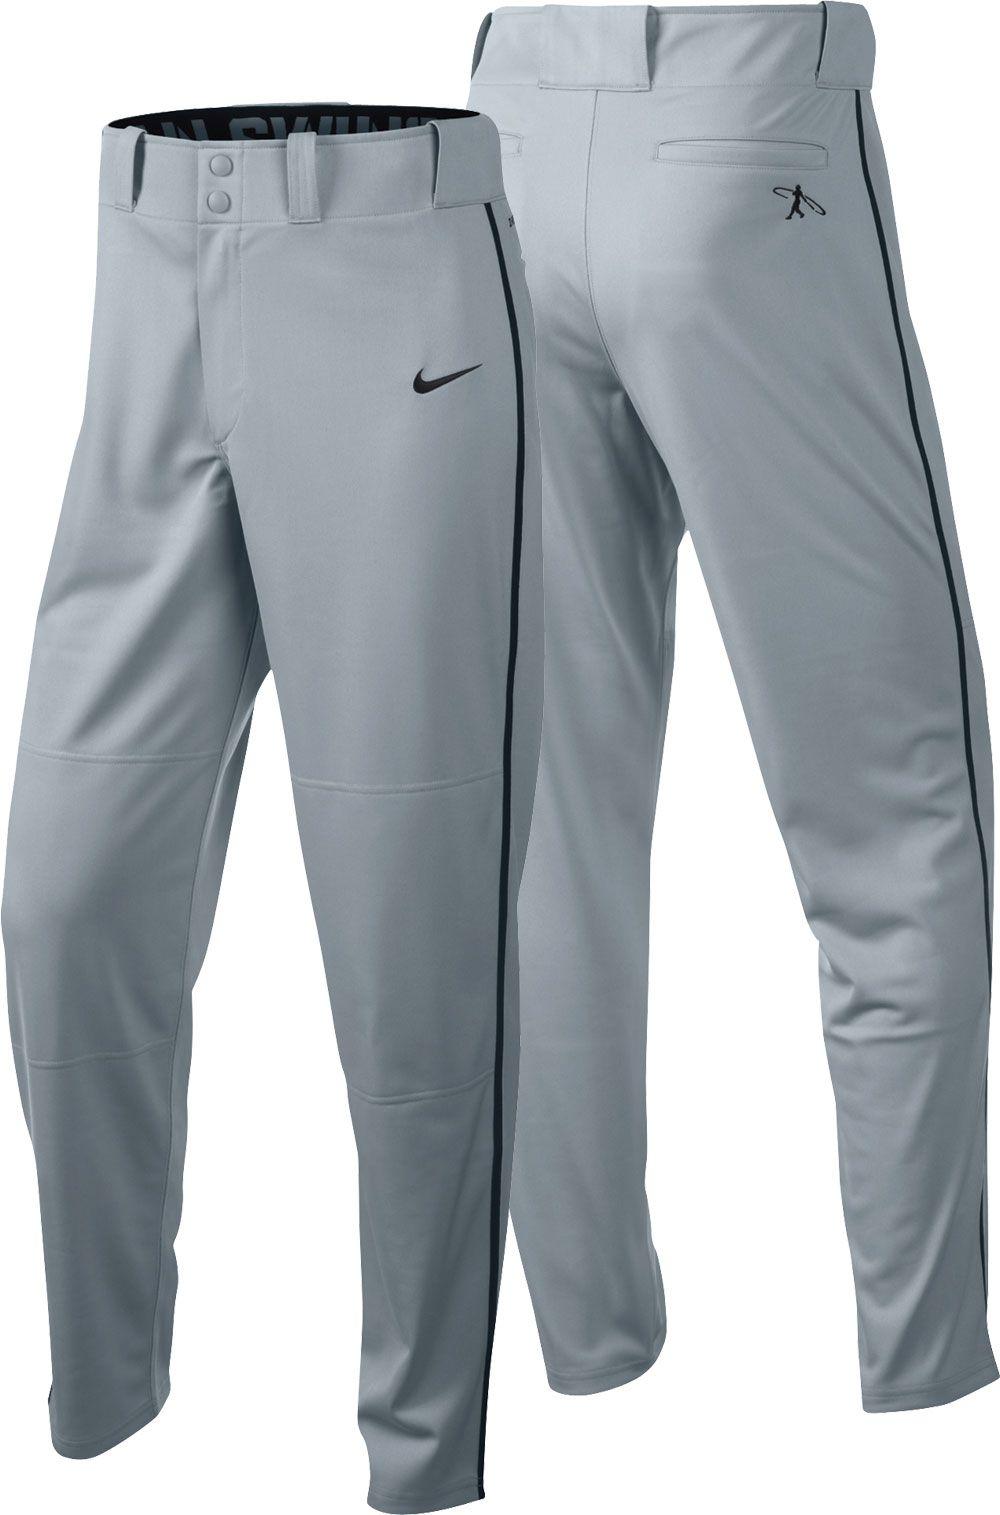 Nike Boys' Swingman Dri-FIT Piped Baseball Pants. 0:00. 0:00 / 0:00.  noImageFound ???